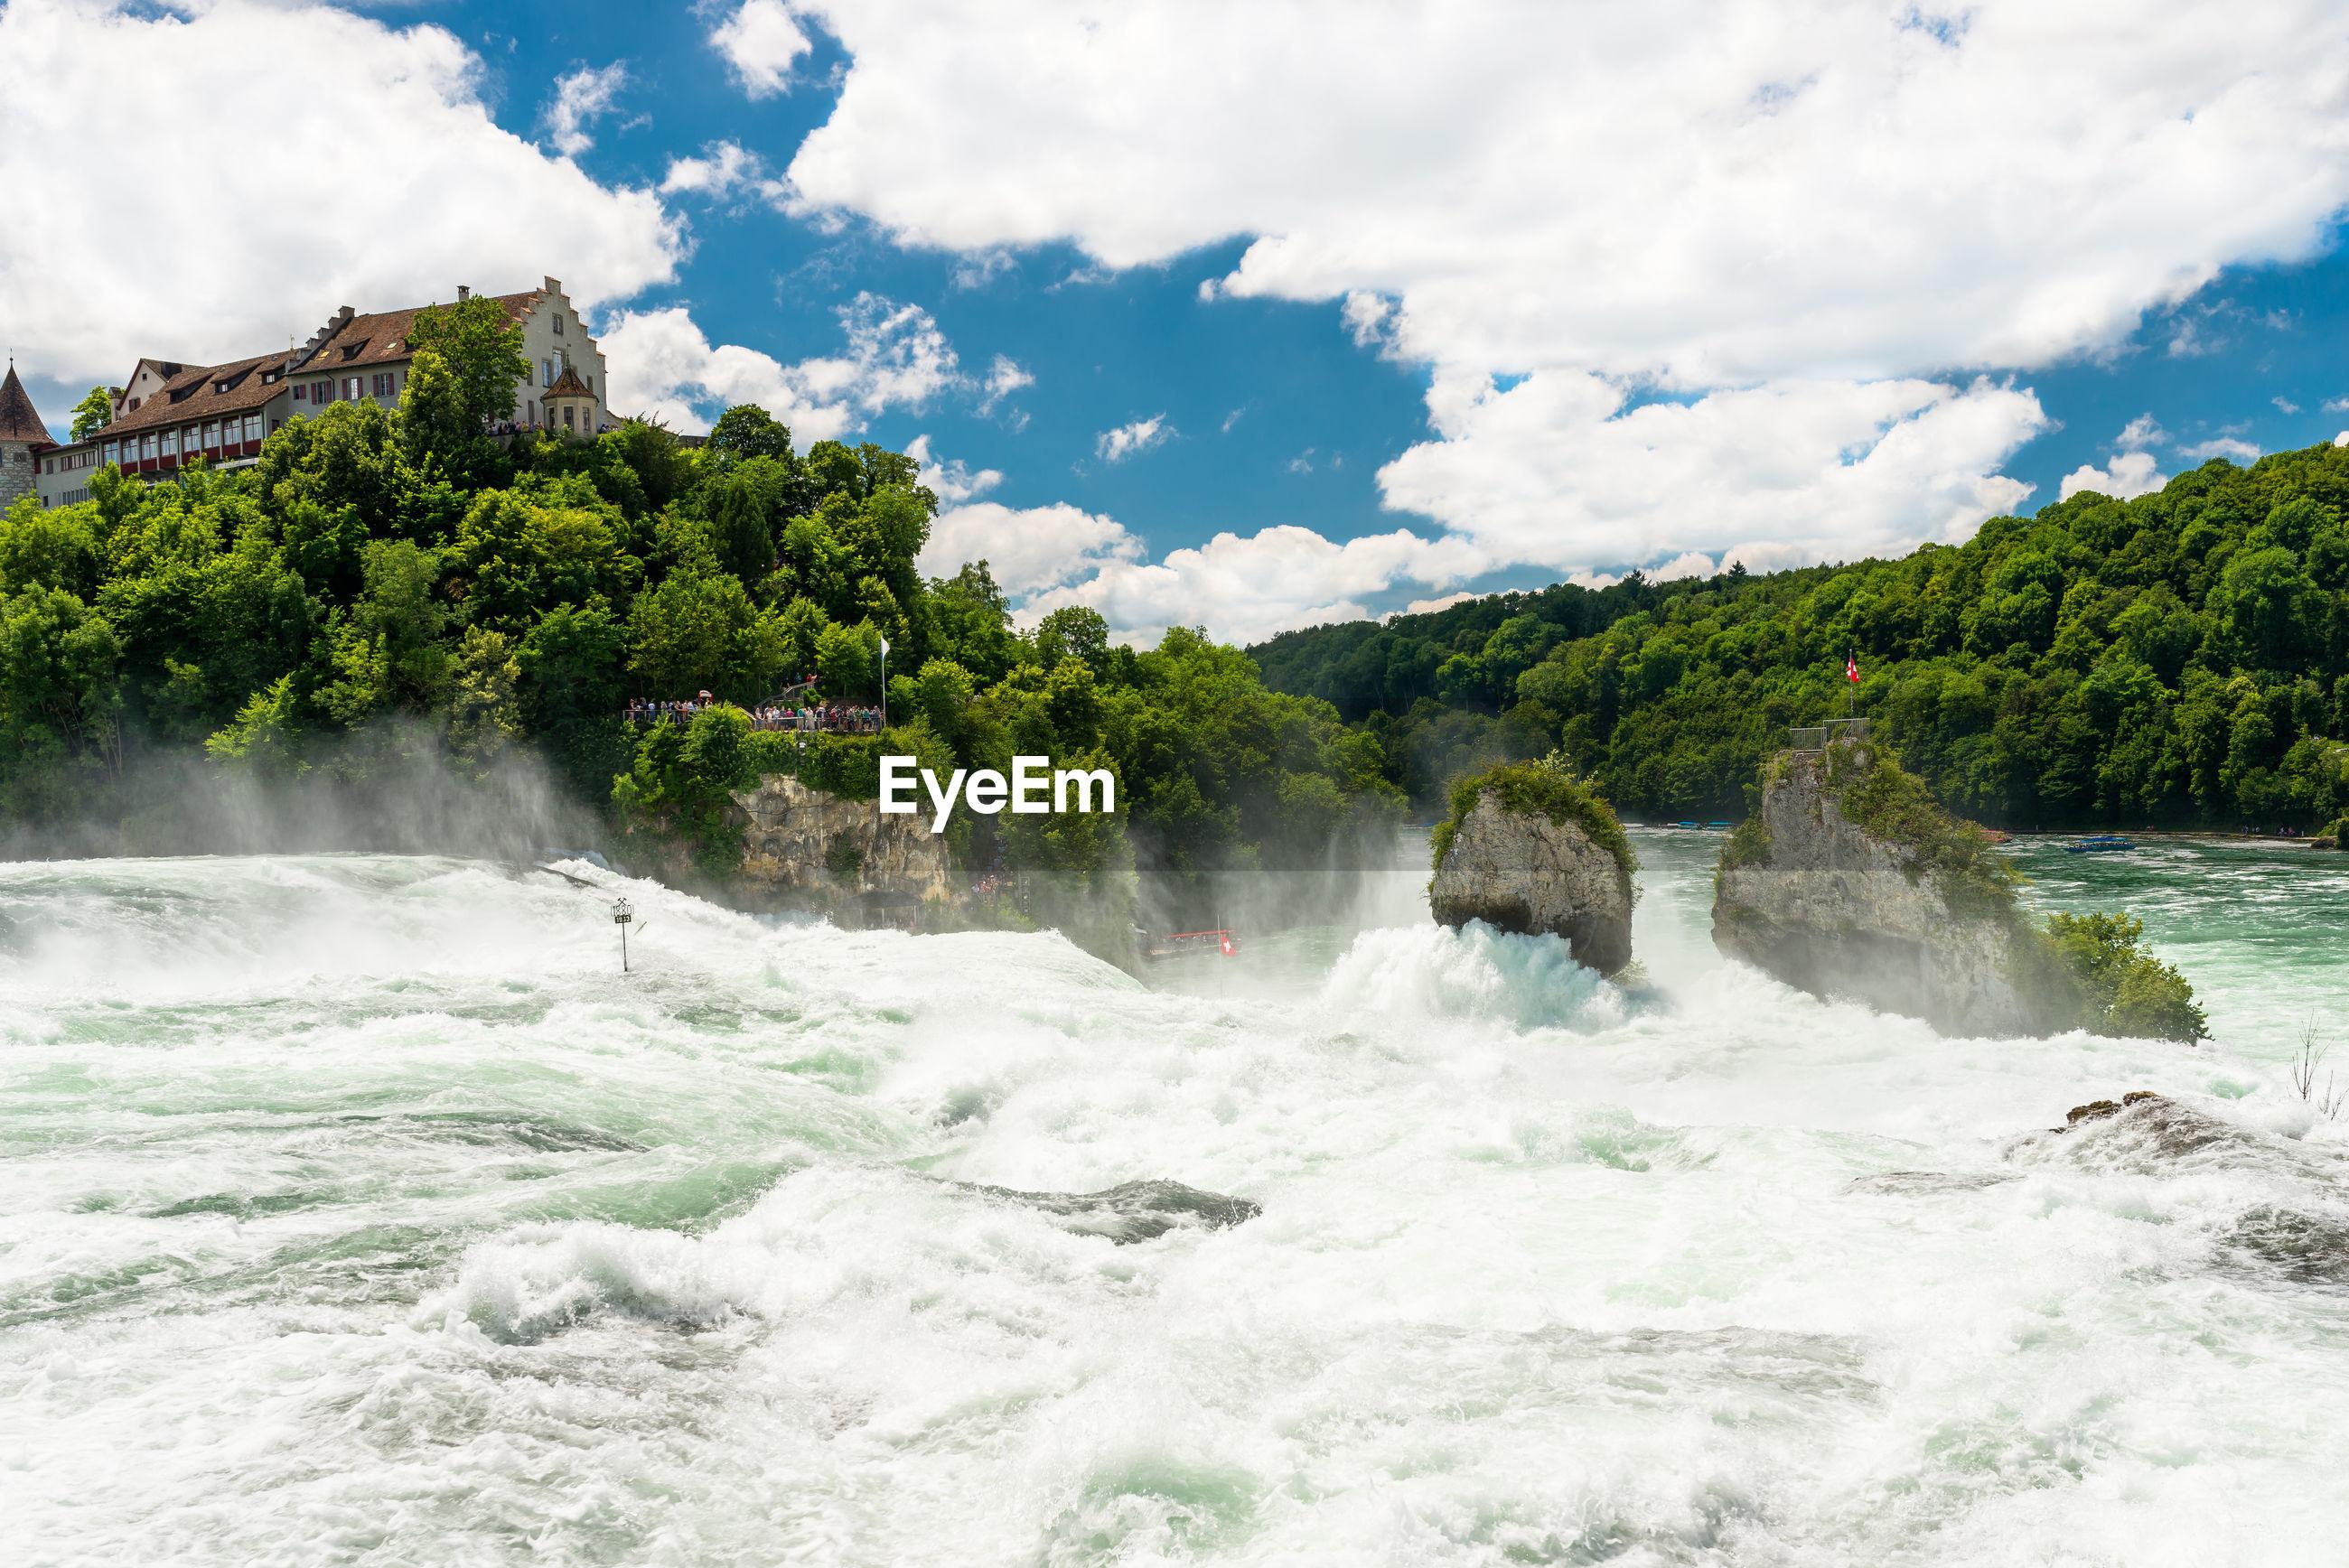 A beautiful waterfall on the river rhine in the city neuhausen am rheinfall in northern switzerland.